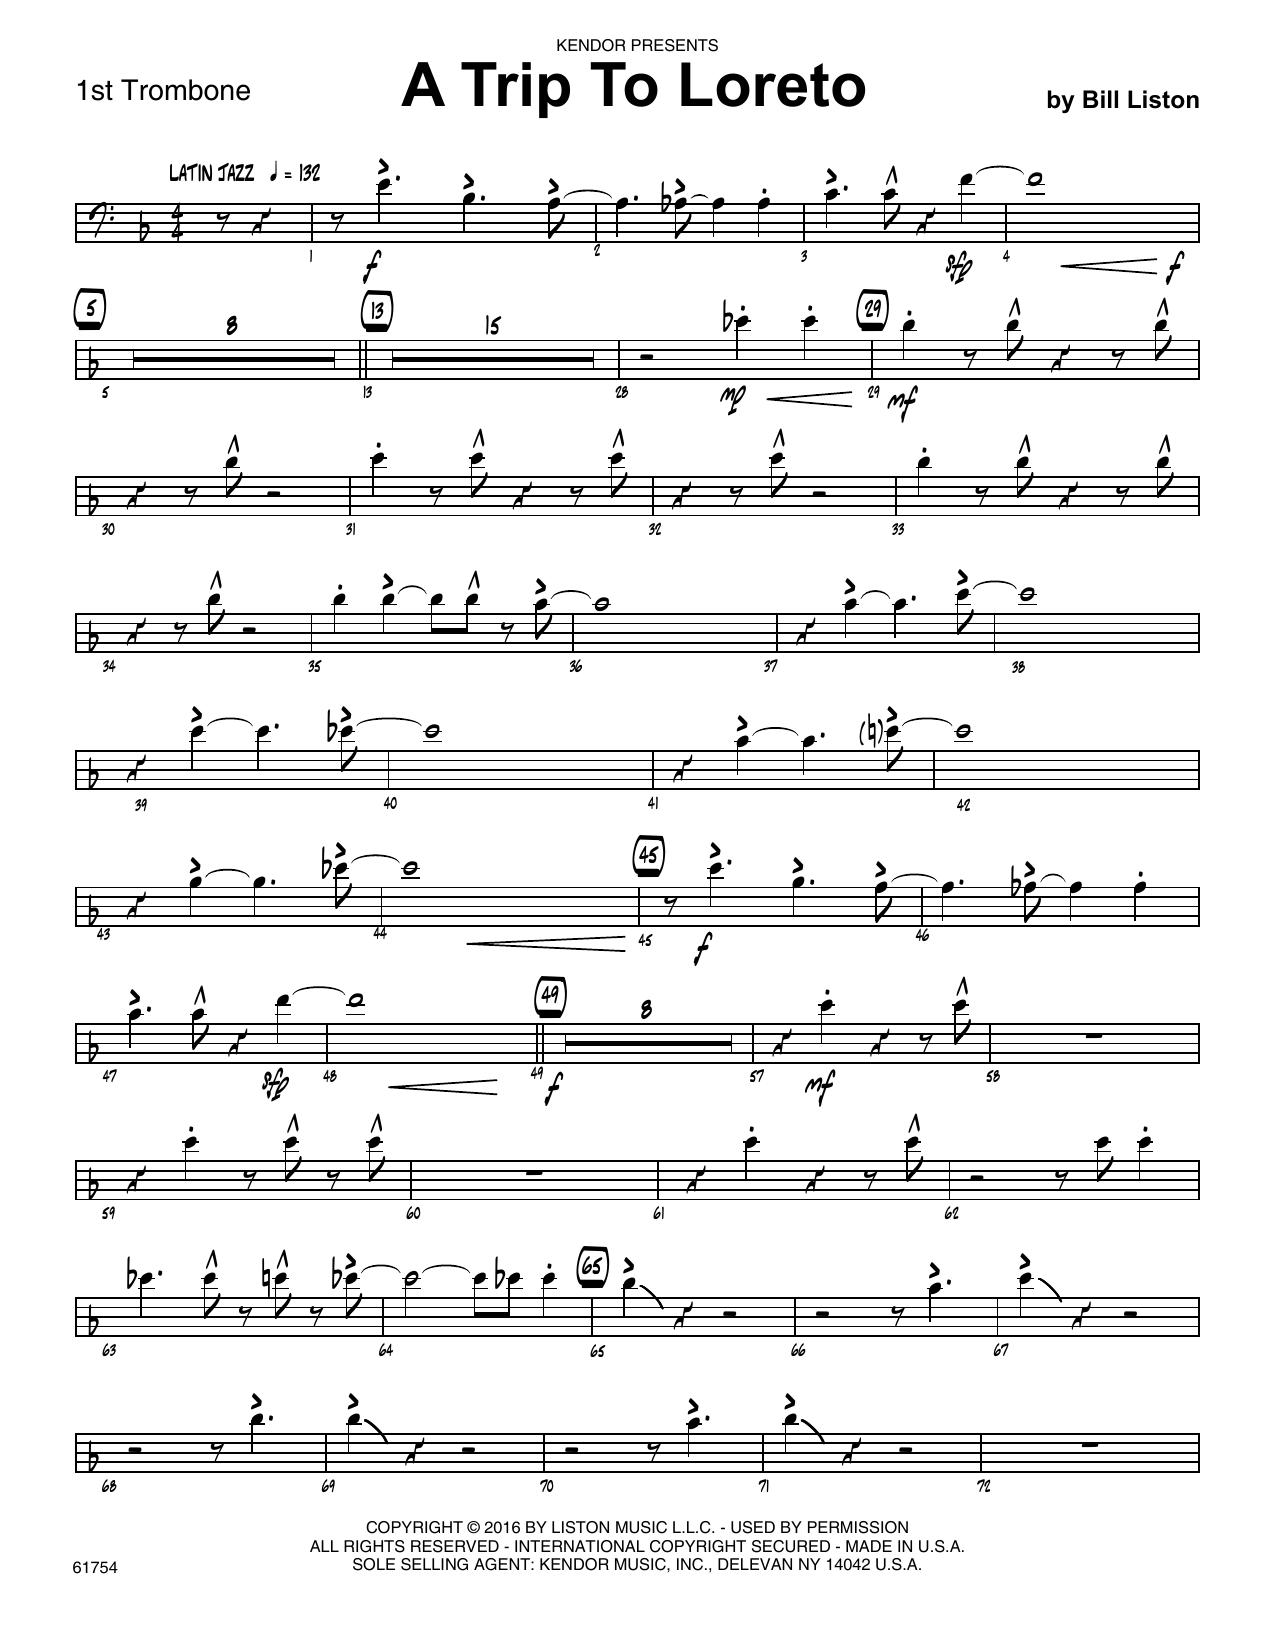 A Trip To Loreto - 1st Trombone Sheet Music